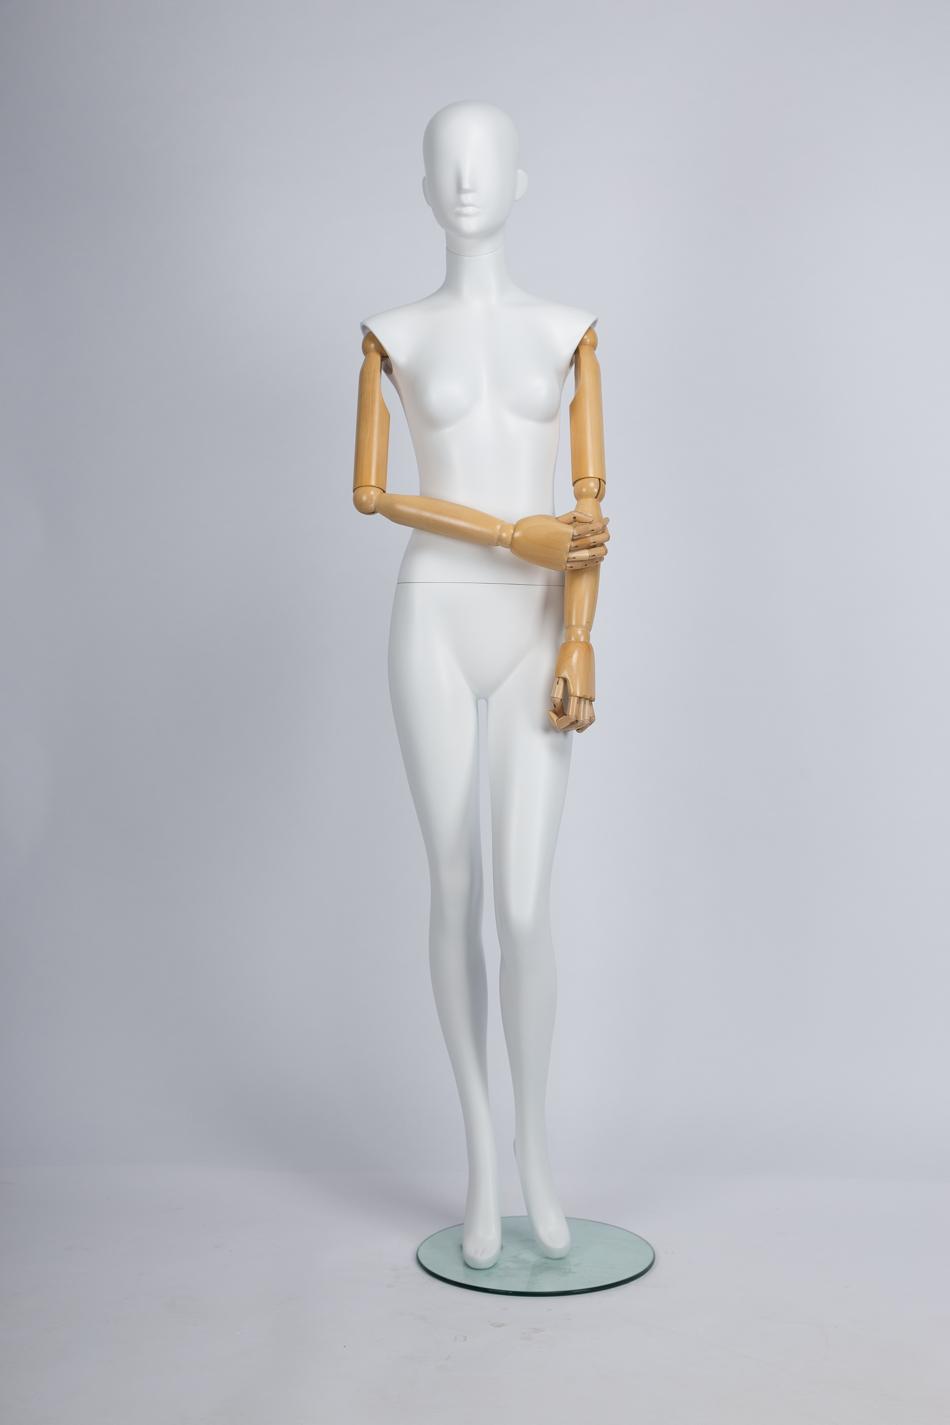 New Ladies Dress Form Mannequin,Female Display Body Form,Styrofoam ...